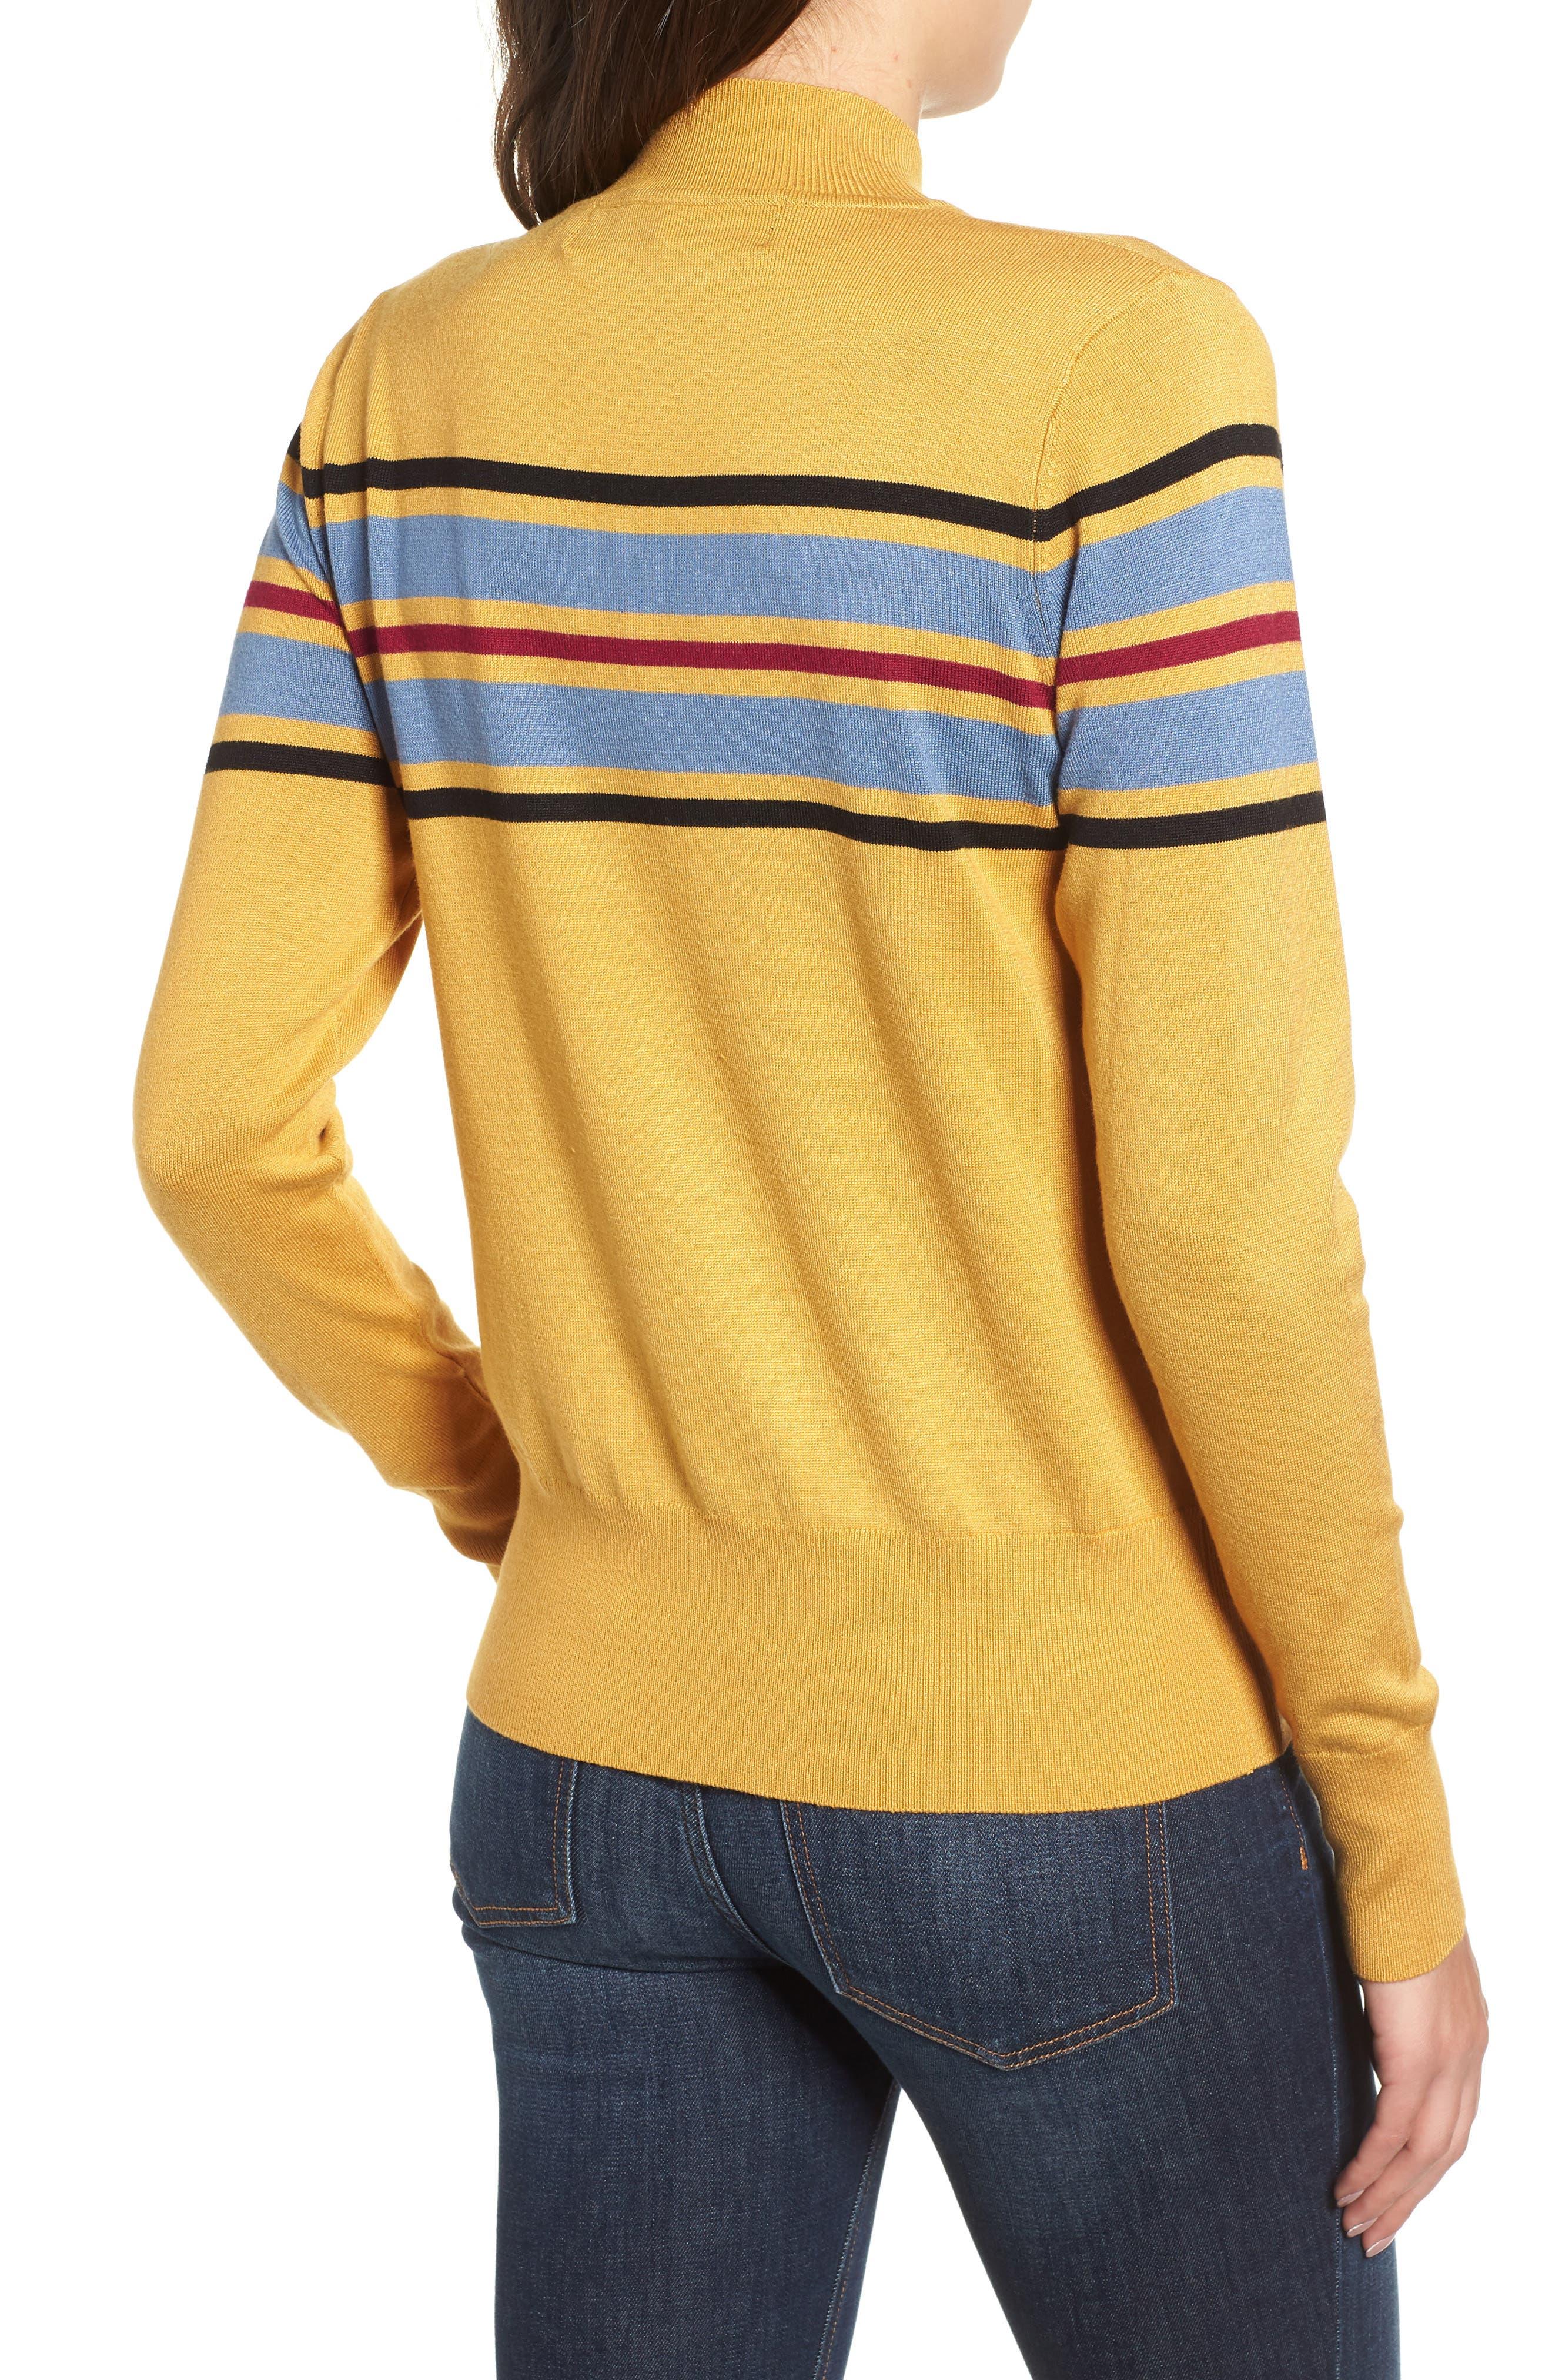 Skivvy Stripe Sweater,                             Alternate thumbnail 2, color,                             MUSTARD